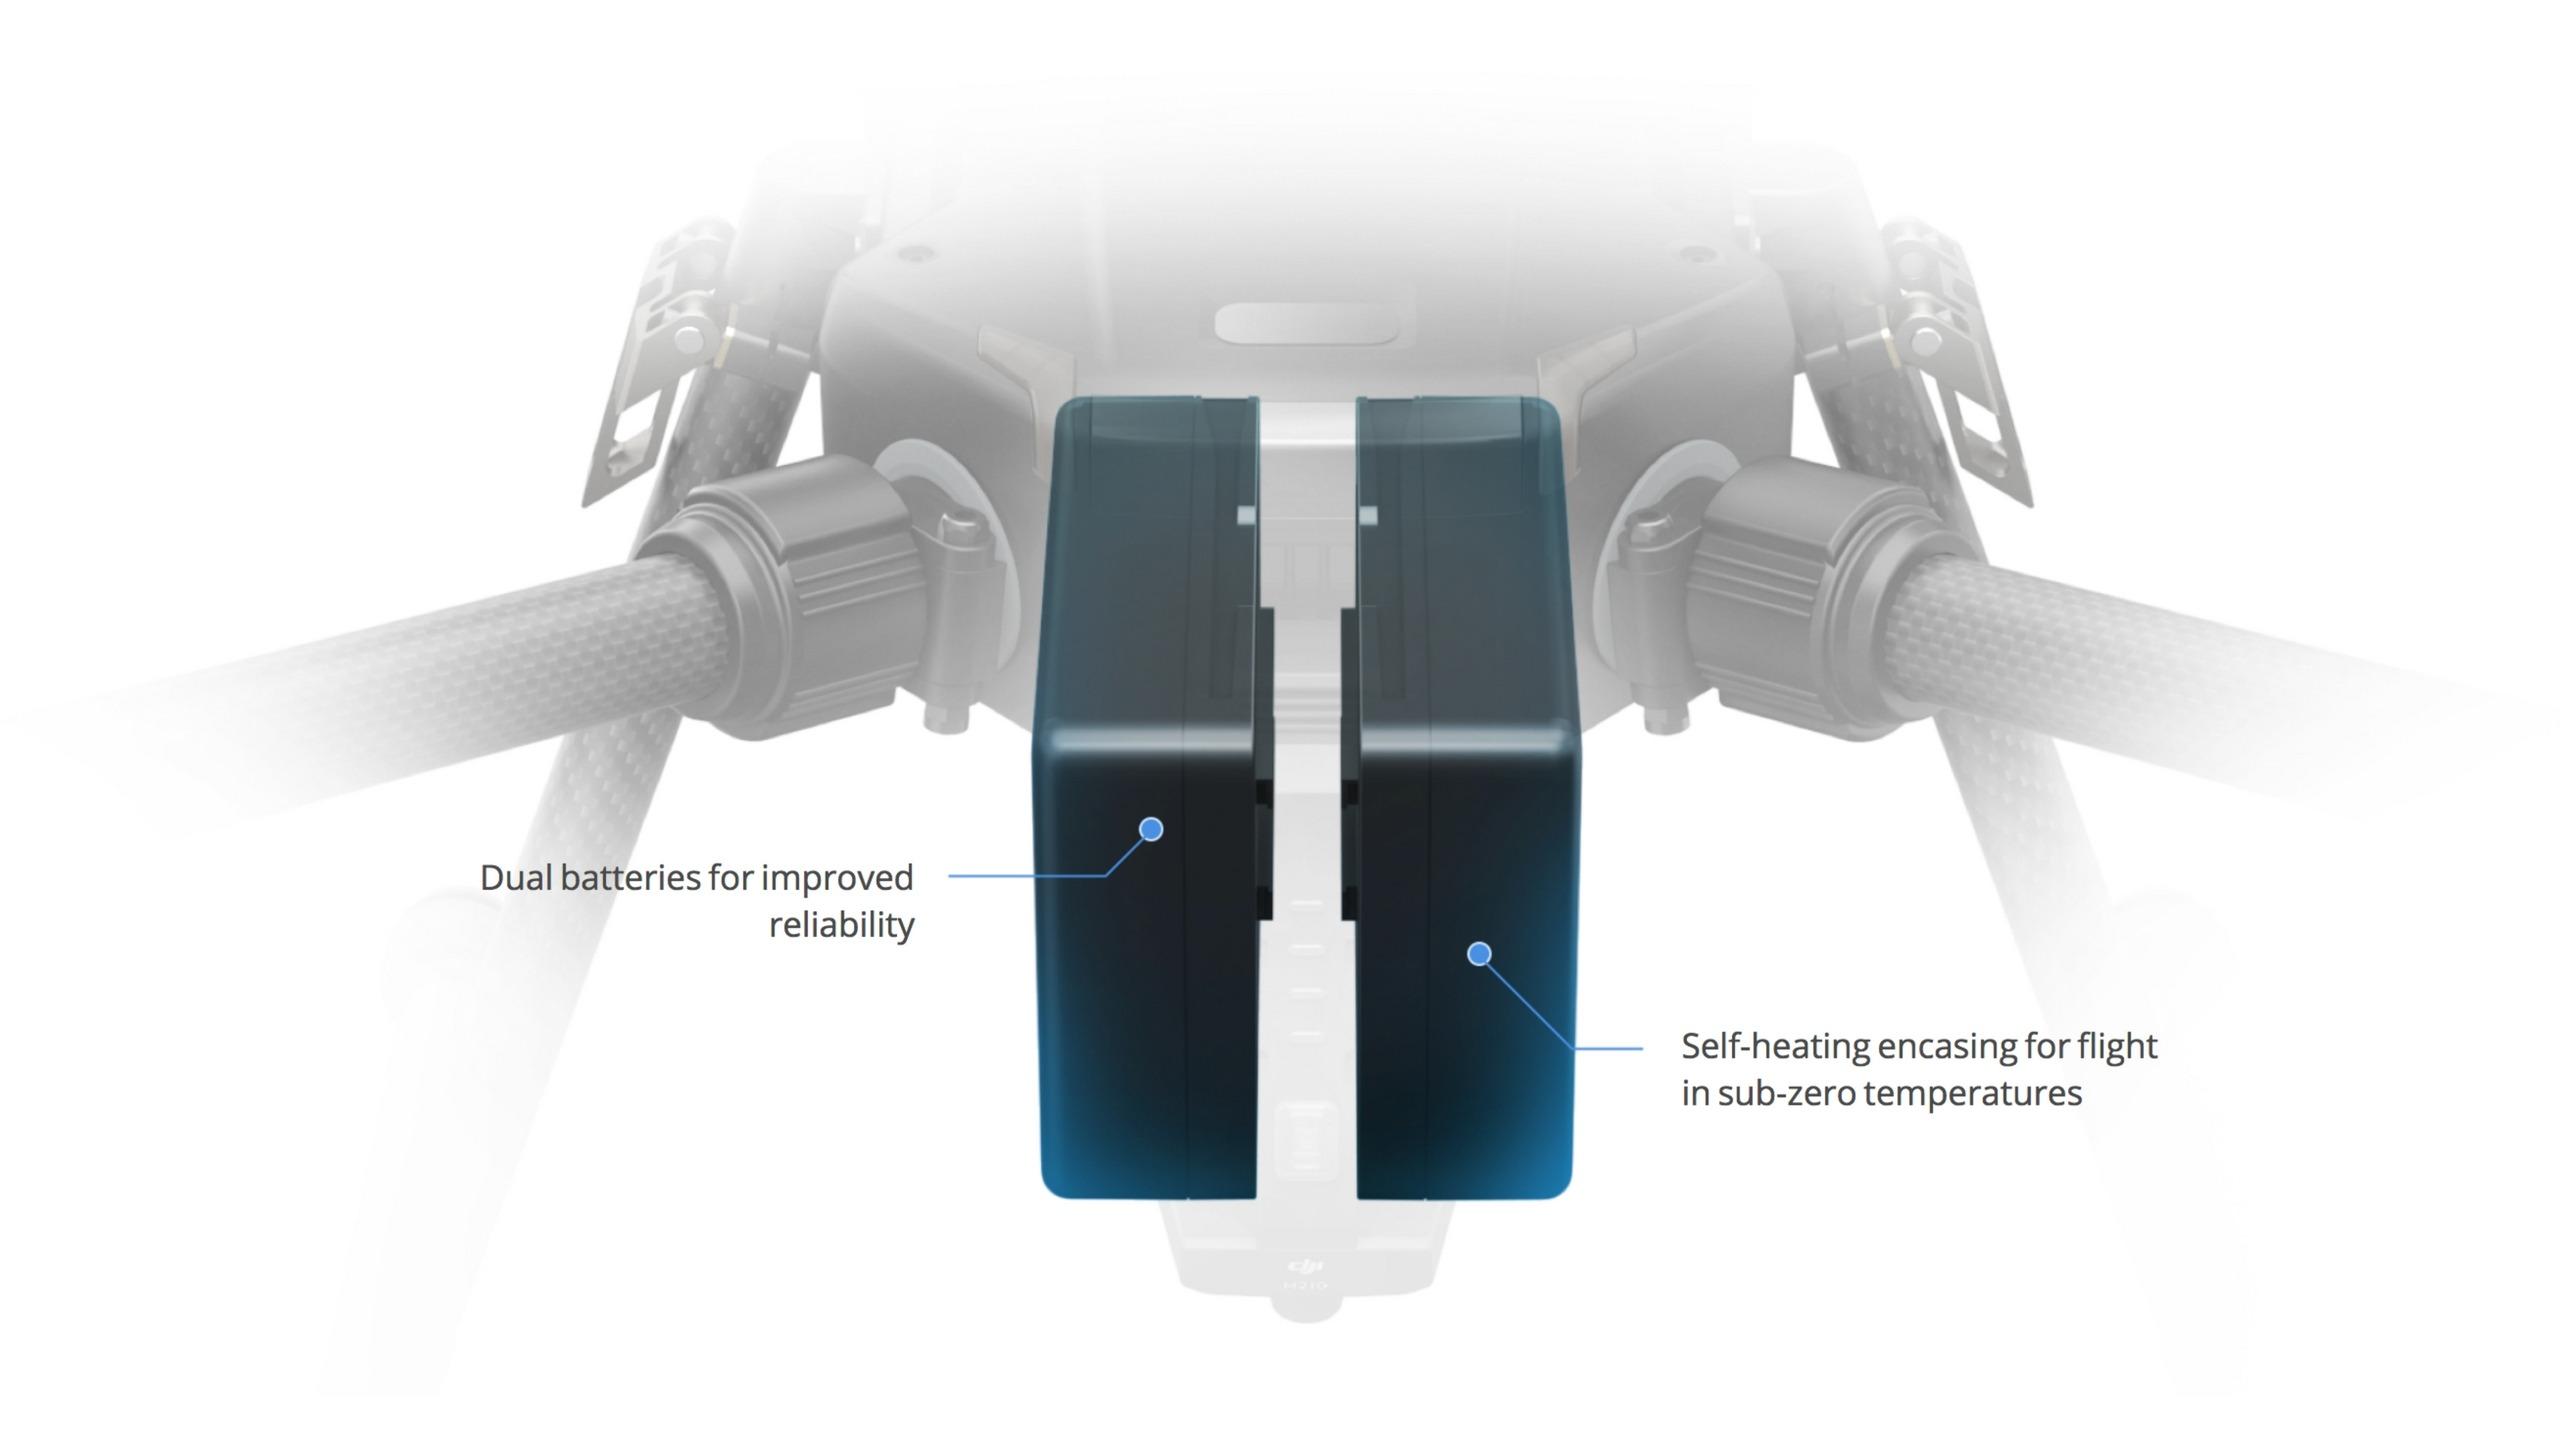 DJI Matrice 200 Series Dual Battery Setup